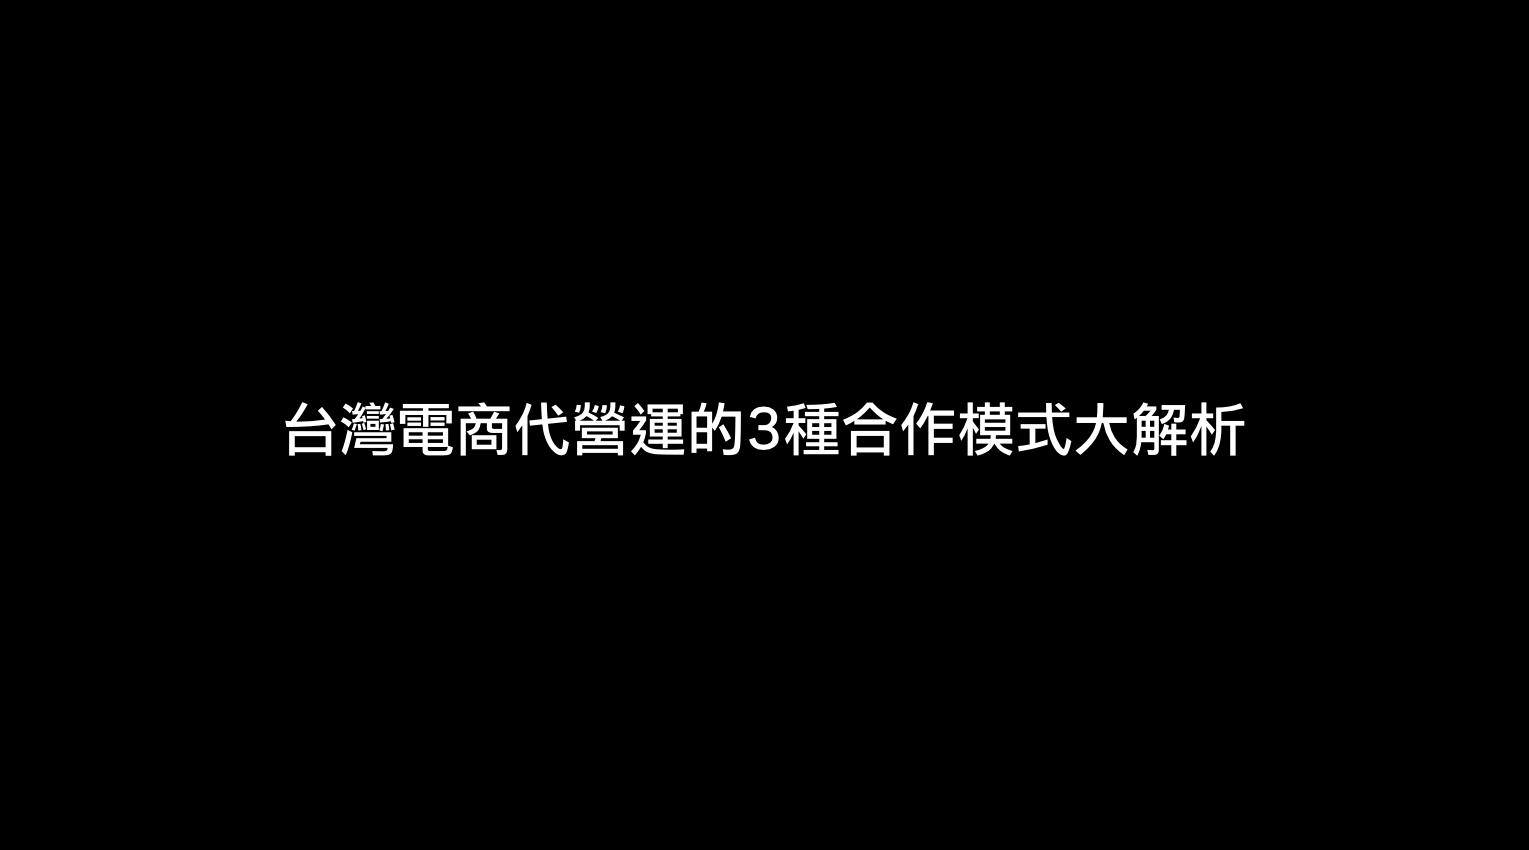 【FETPO電商代營運】台灣電商代營運的3種合作模式大解析